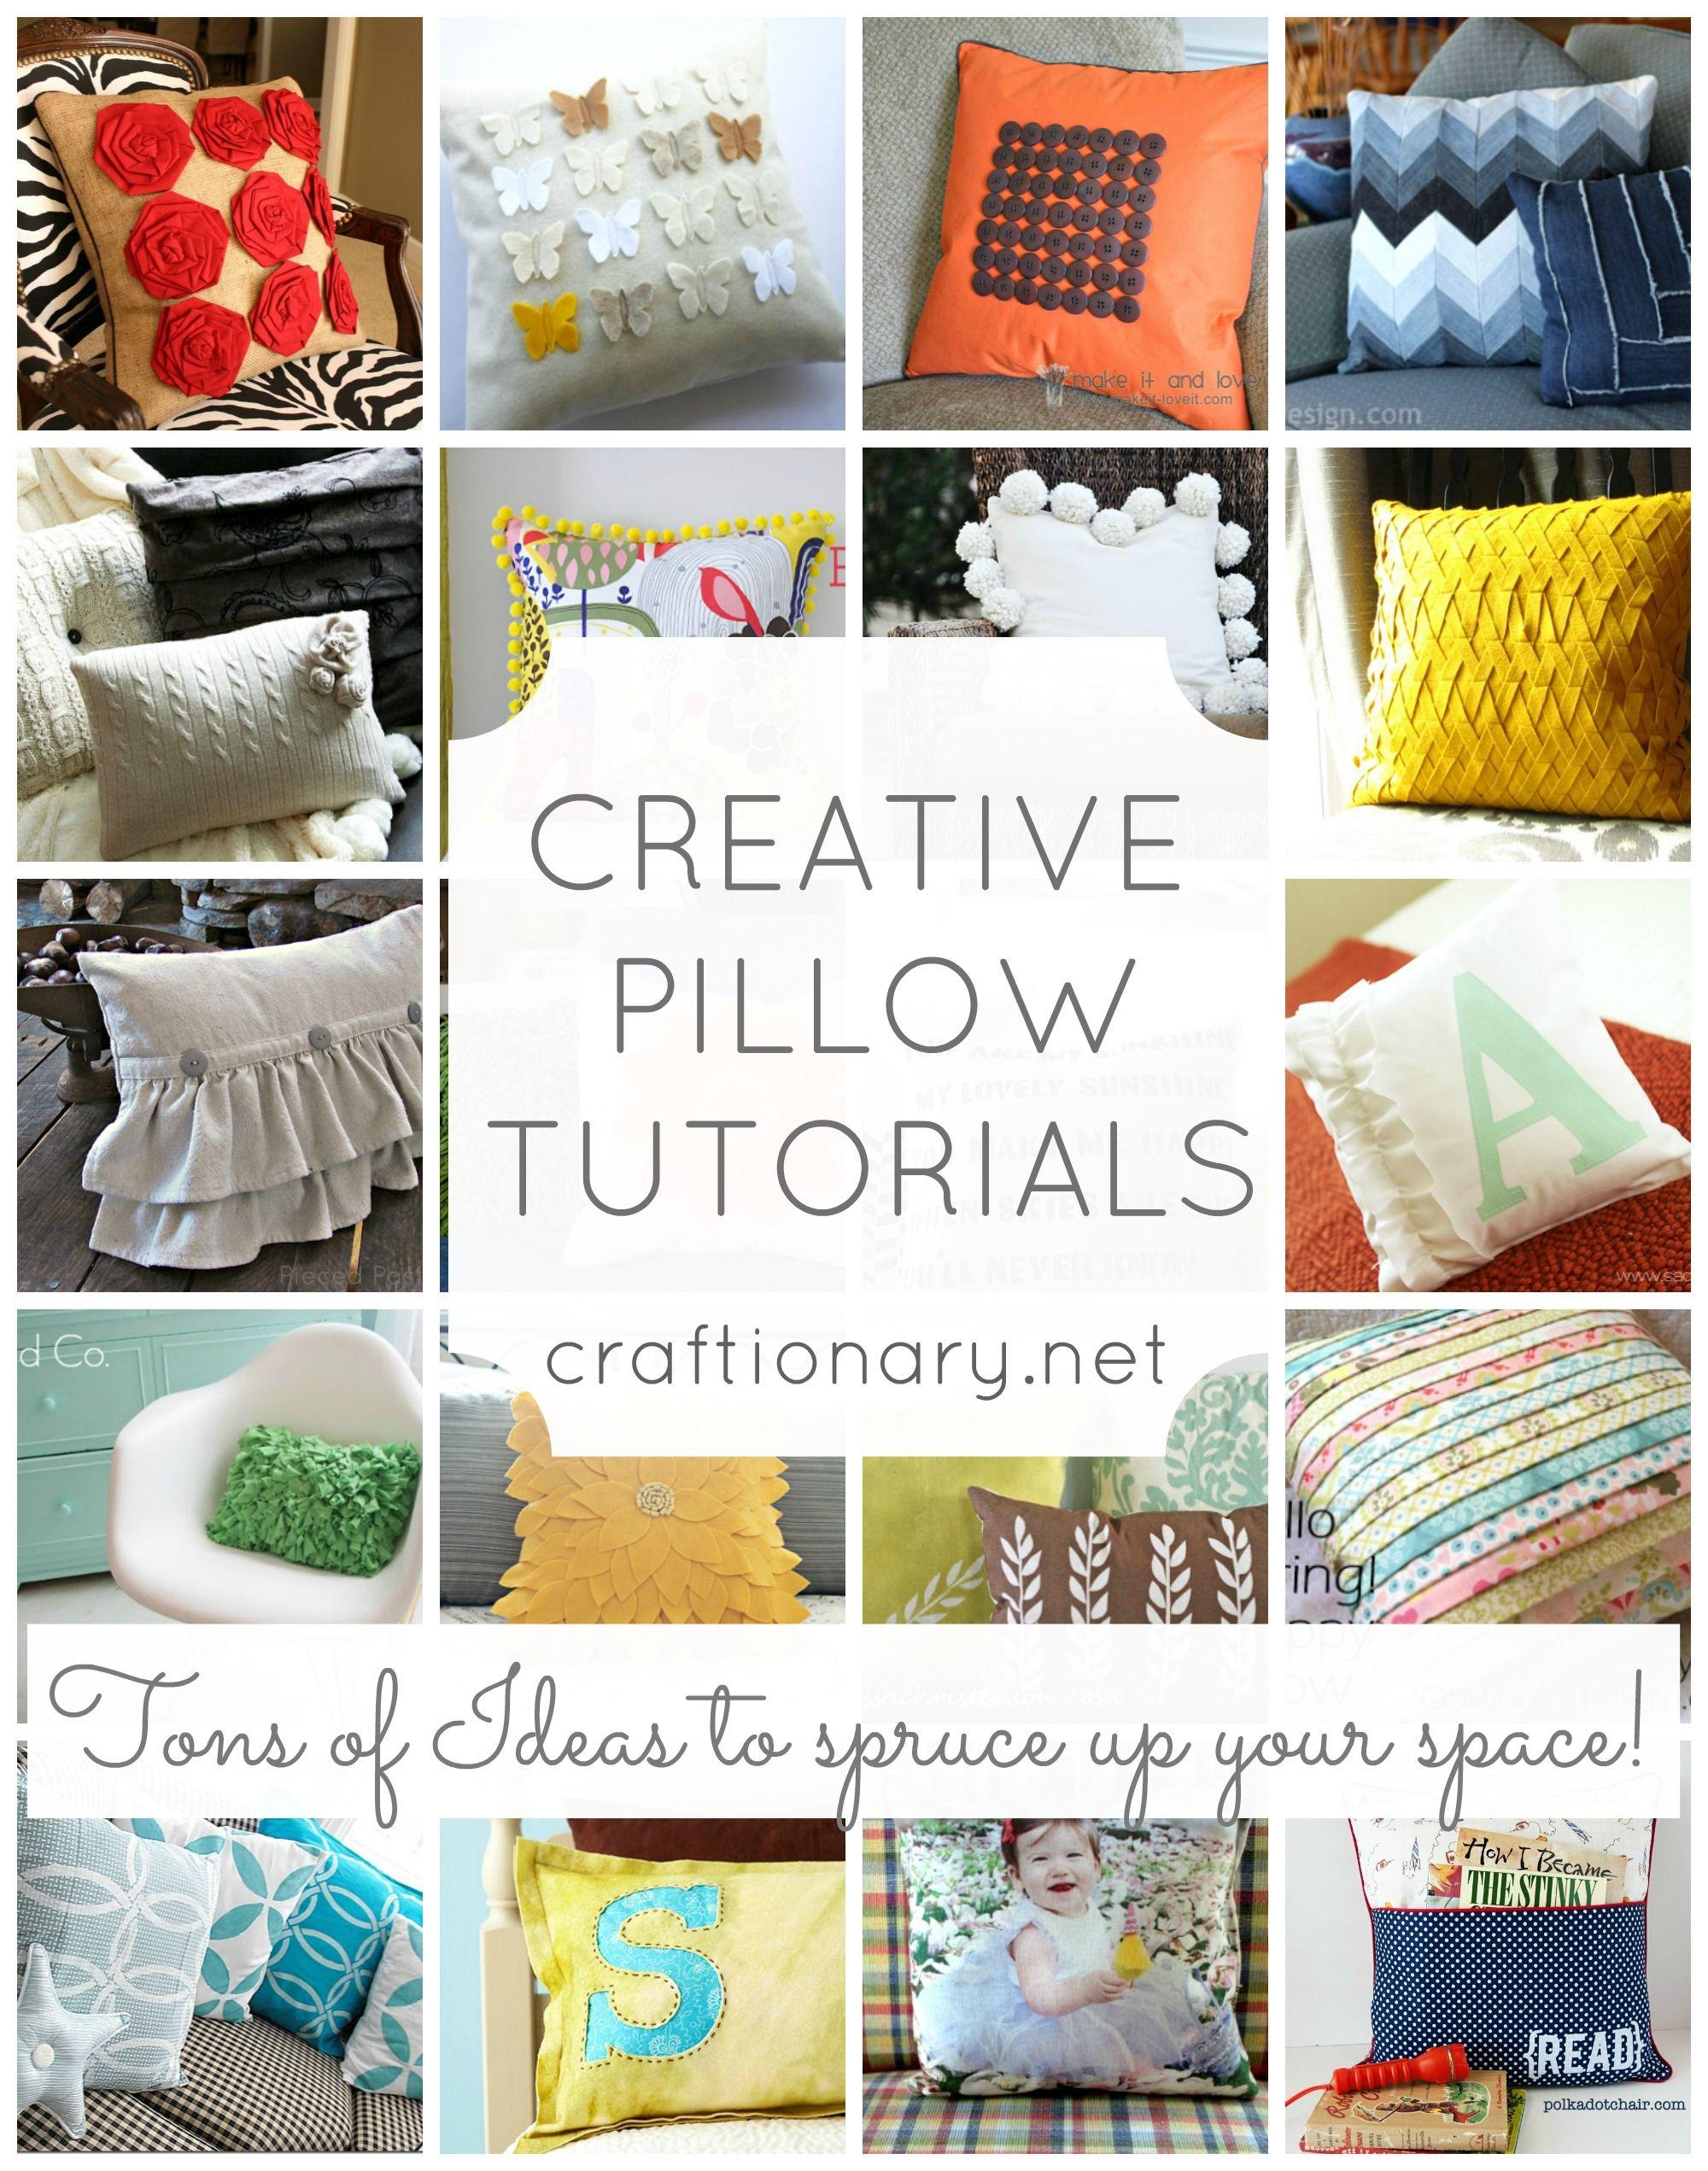 9 Easy decorative pillow tutorials (Make throw pillows